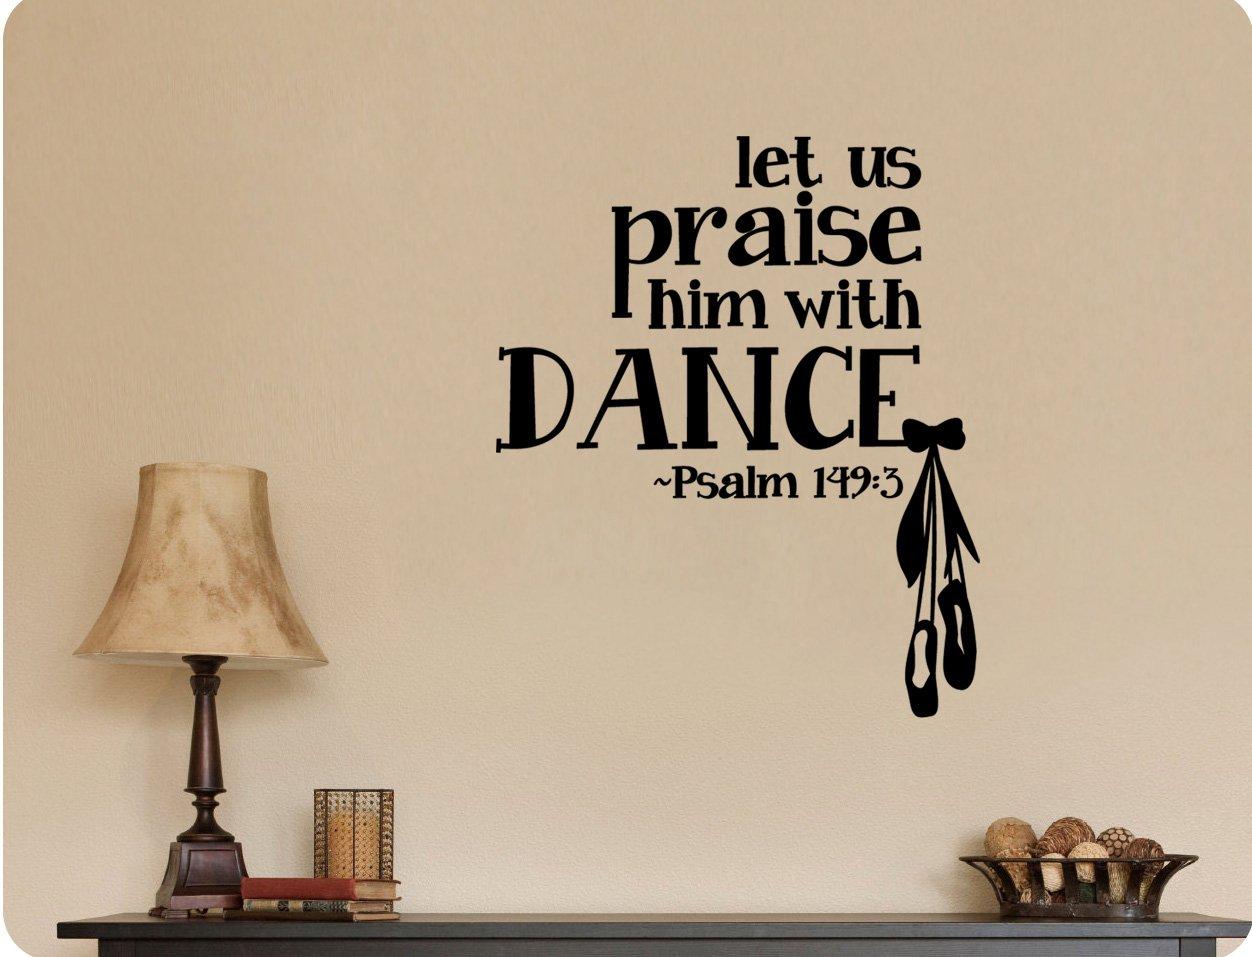 28''x24'' Let Us Praise him with Dance Psalm 149:3 Scripture Bible Christian Girl Dancer Ballet Wall Decal Sticker Art Mural Home DŽcor Quote